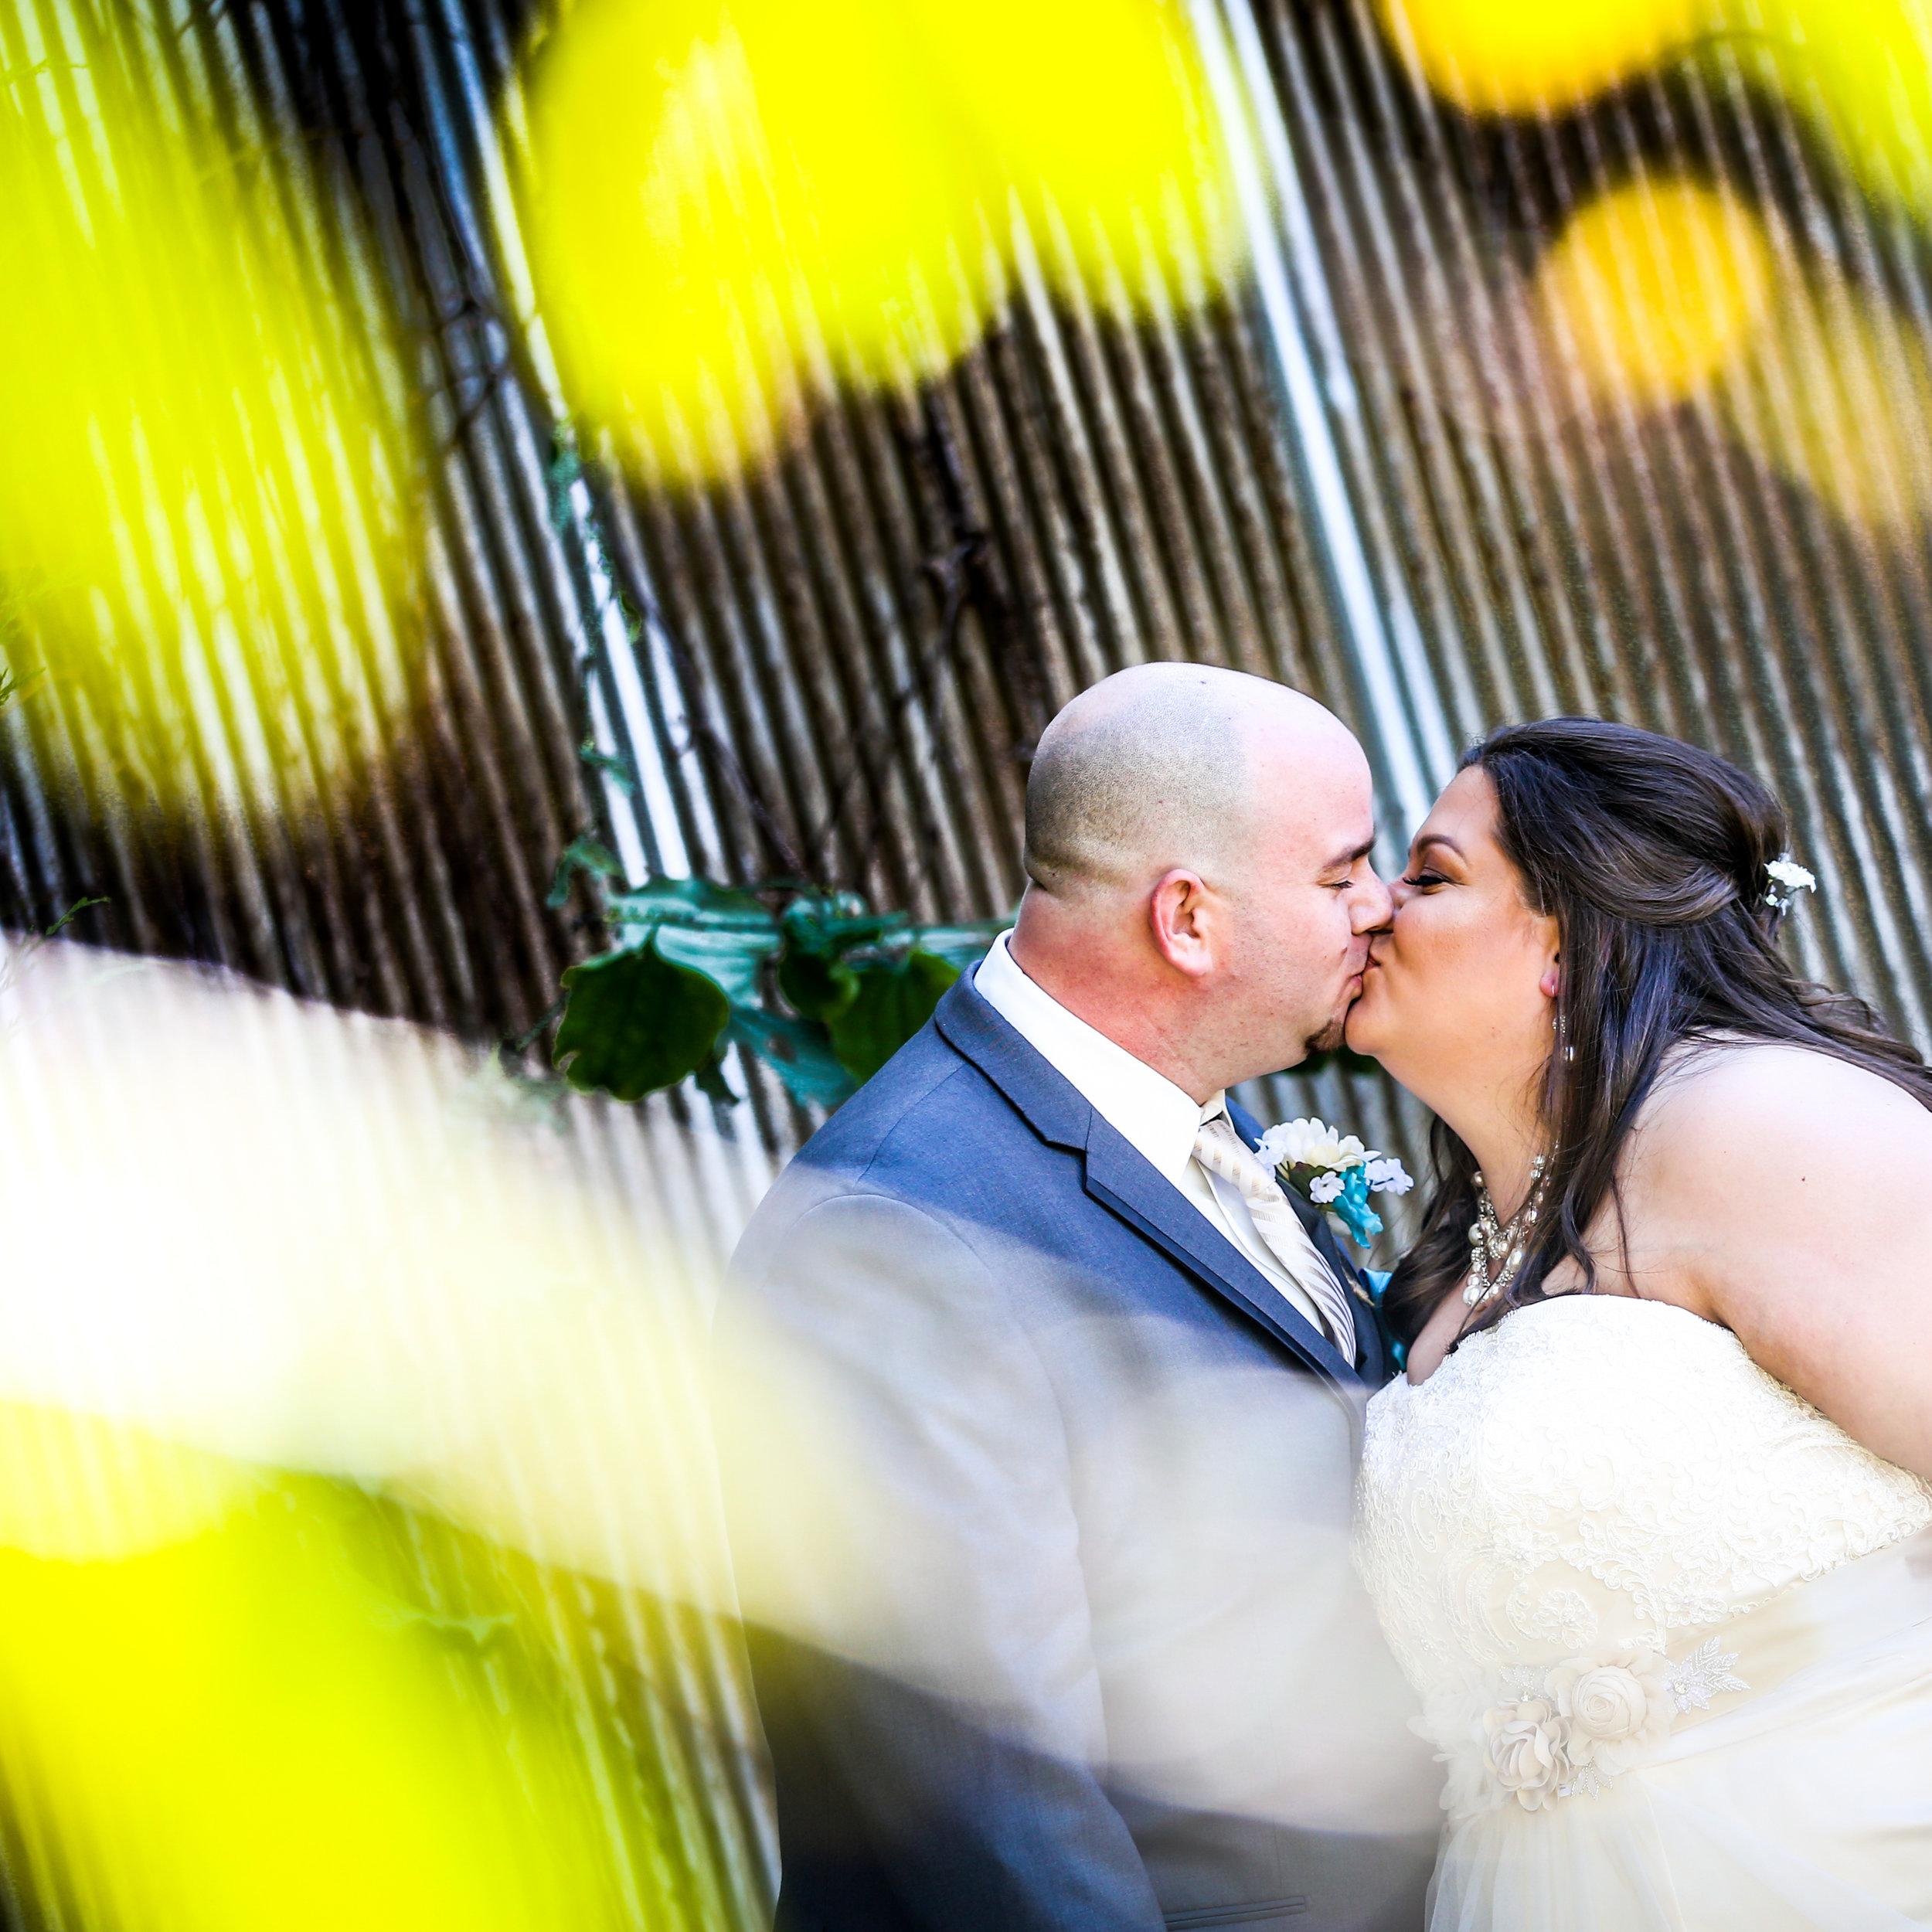 WeddingWebsite-28.jpg